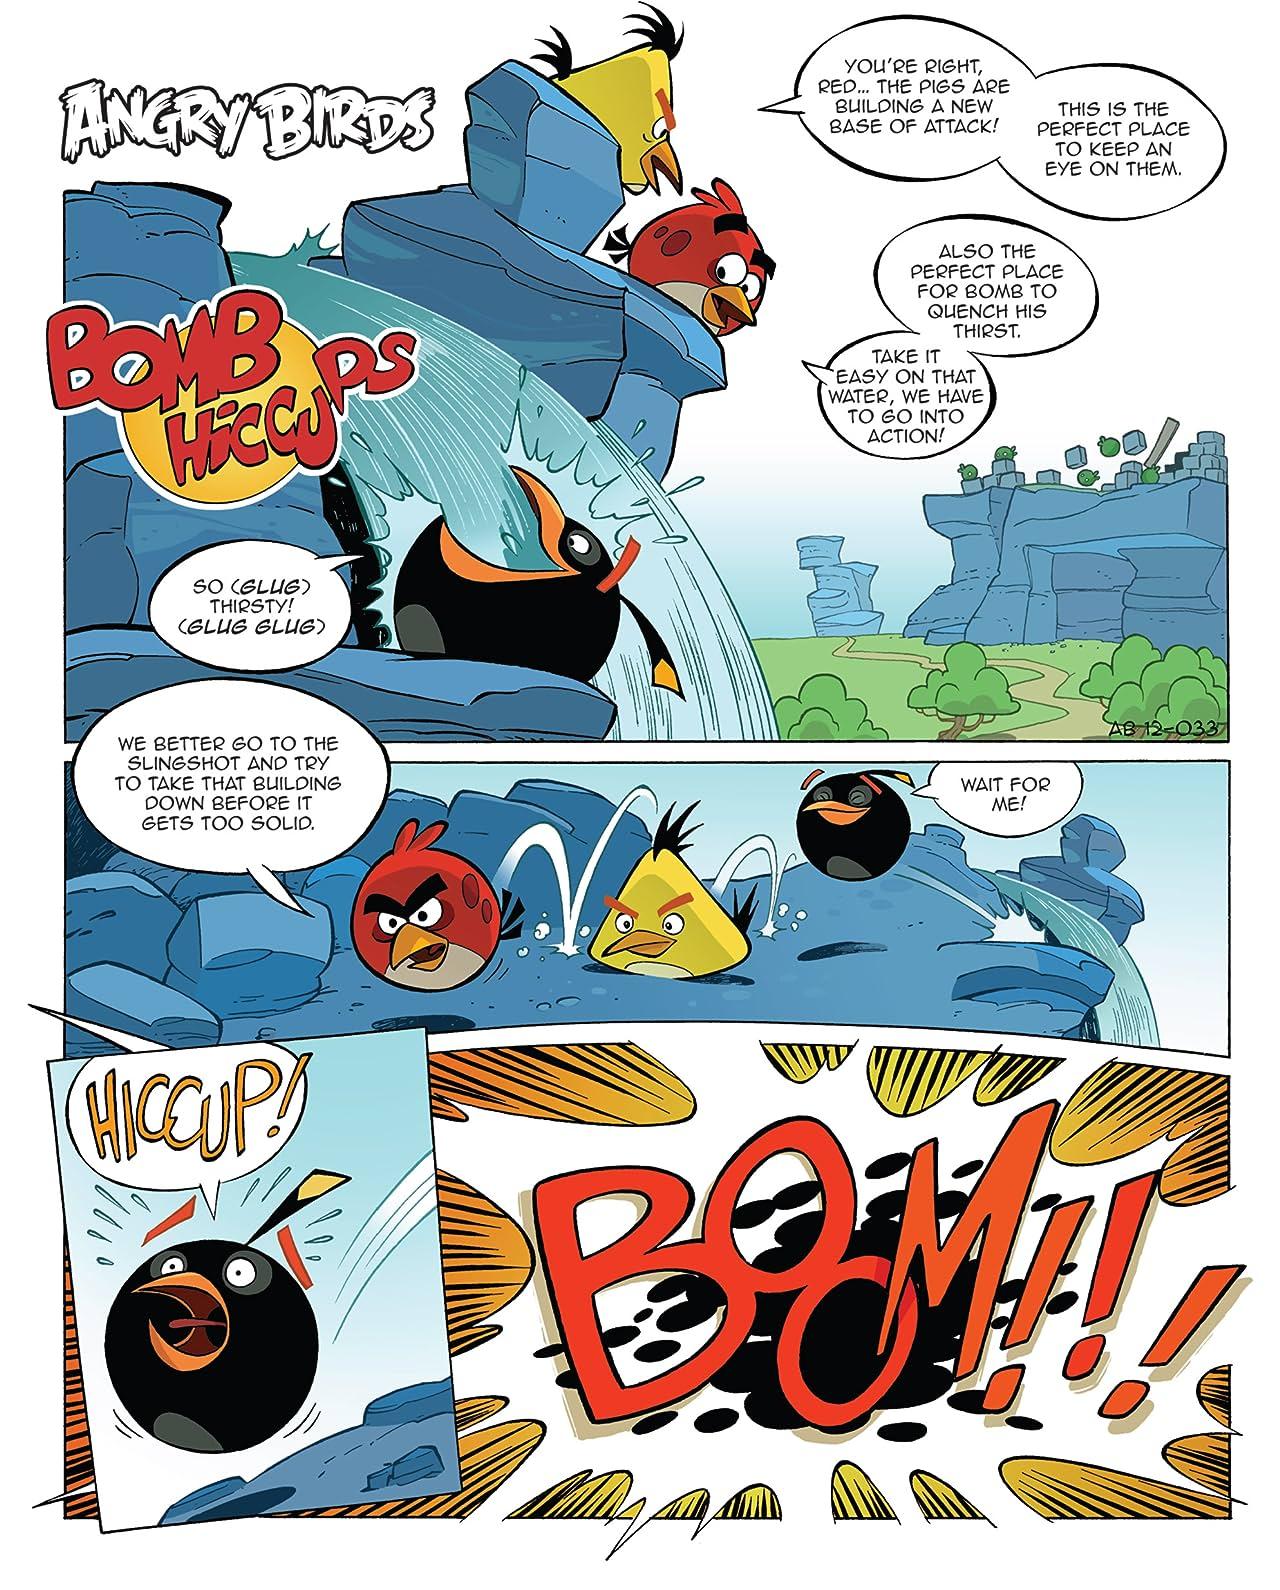 Angry Birds #1: Mini-Comic #1